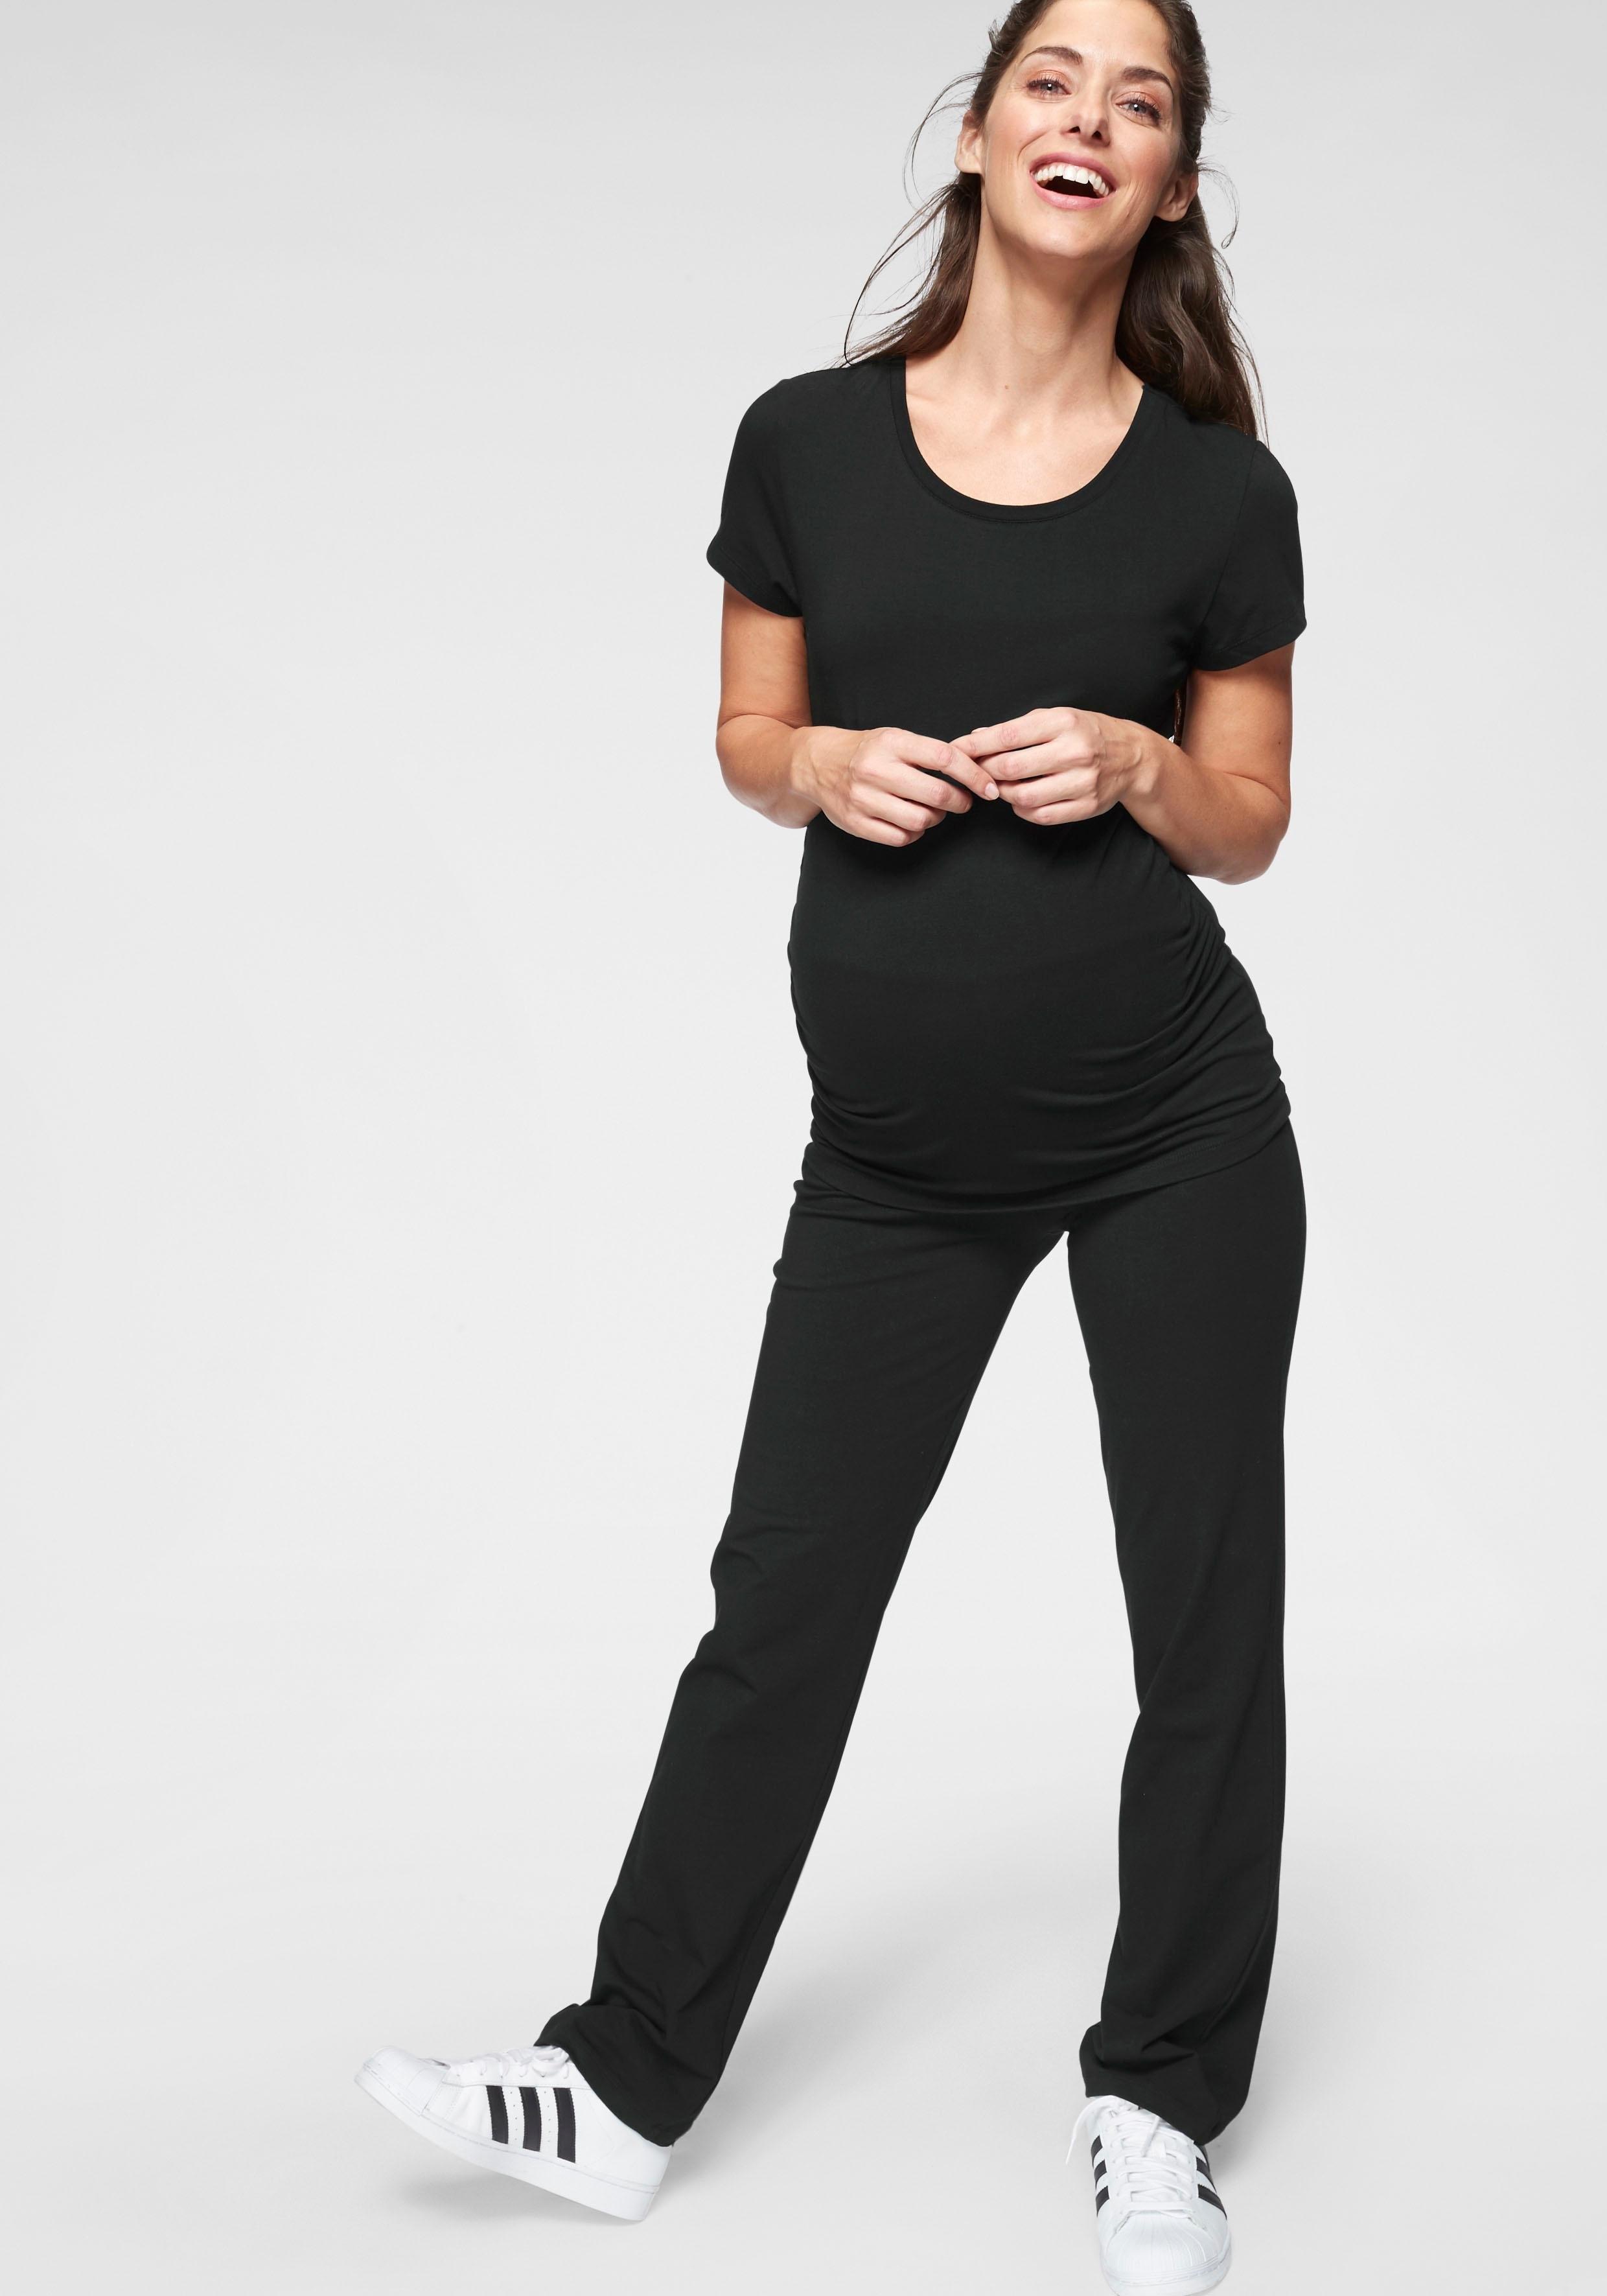 Neun Monate shirt & broek (set, 2-delig) - verschillende betaalmethodes